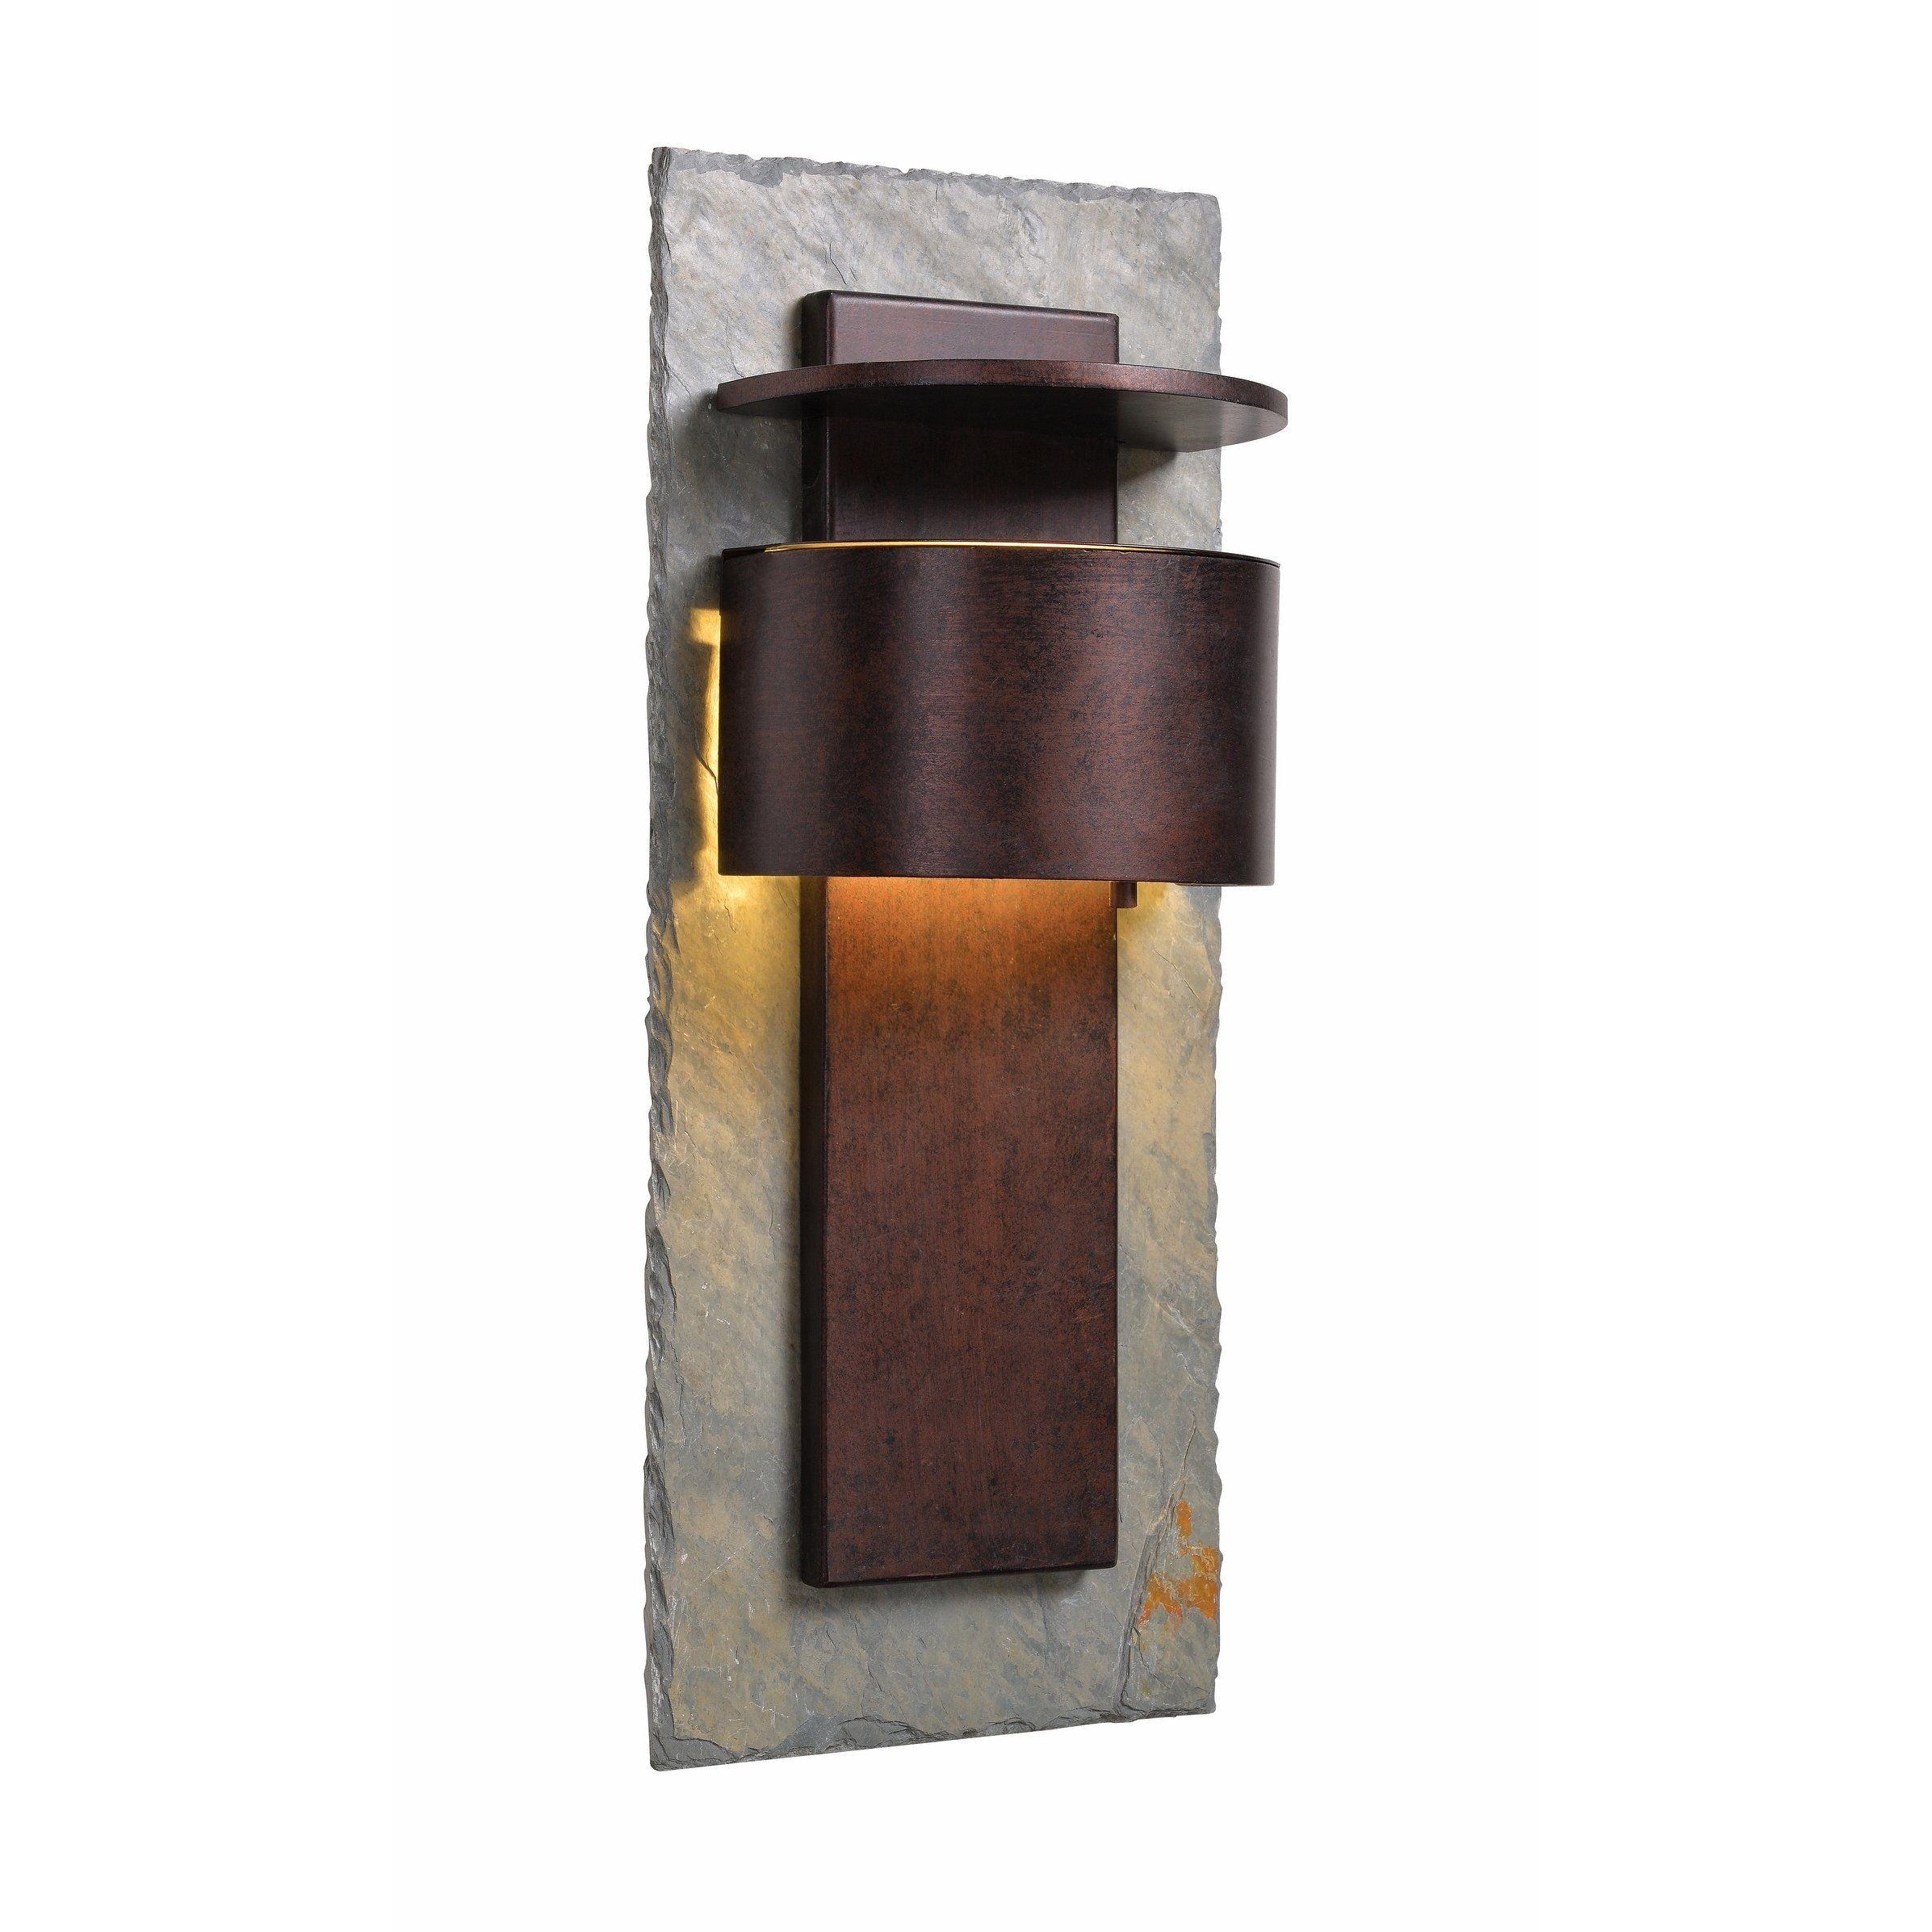 Darius 24 Dark Sky Led Wall Lantern Slate And Copper Multicolor Design Craft Kenroy Home Outdoor Wall Lantern Outdoor Walls